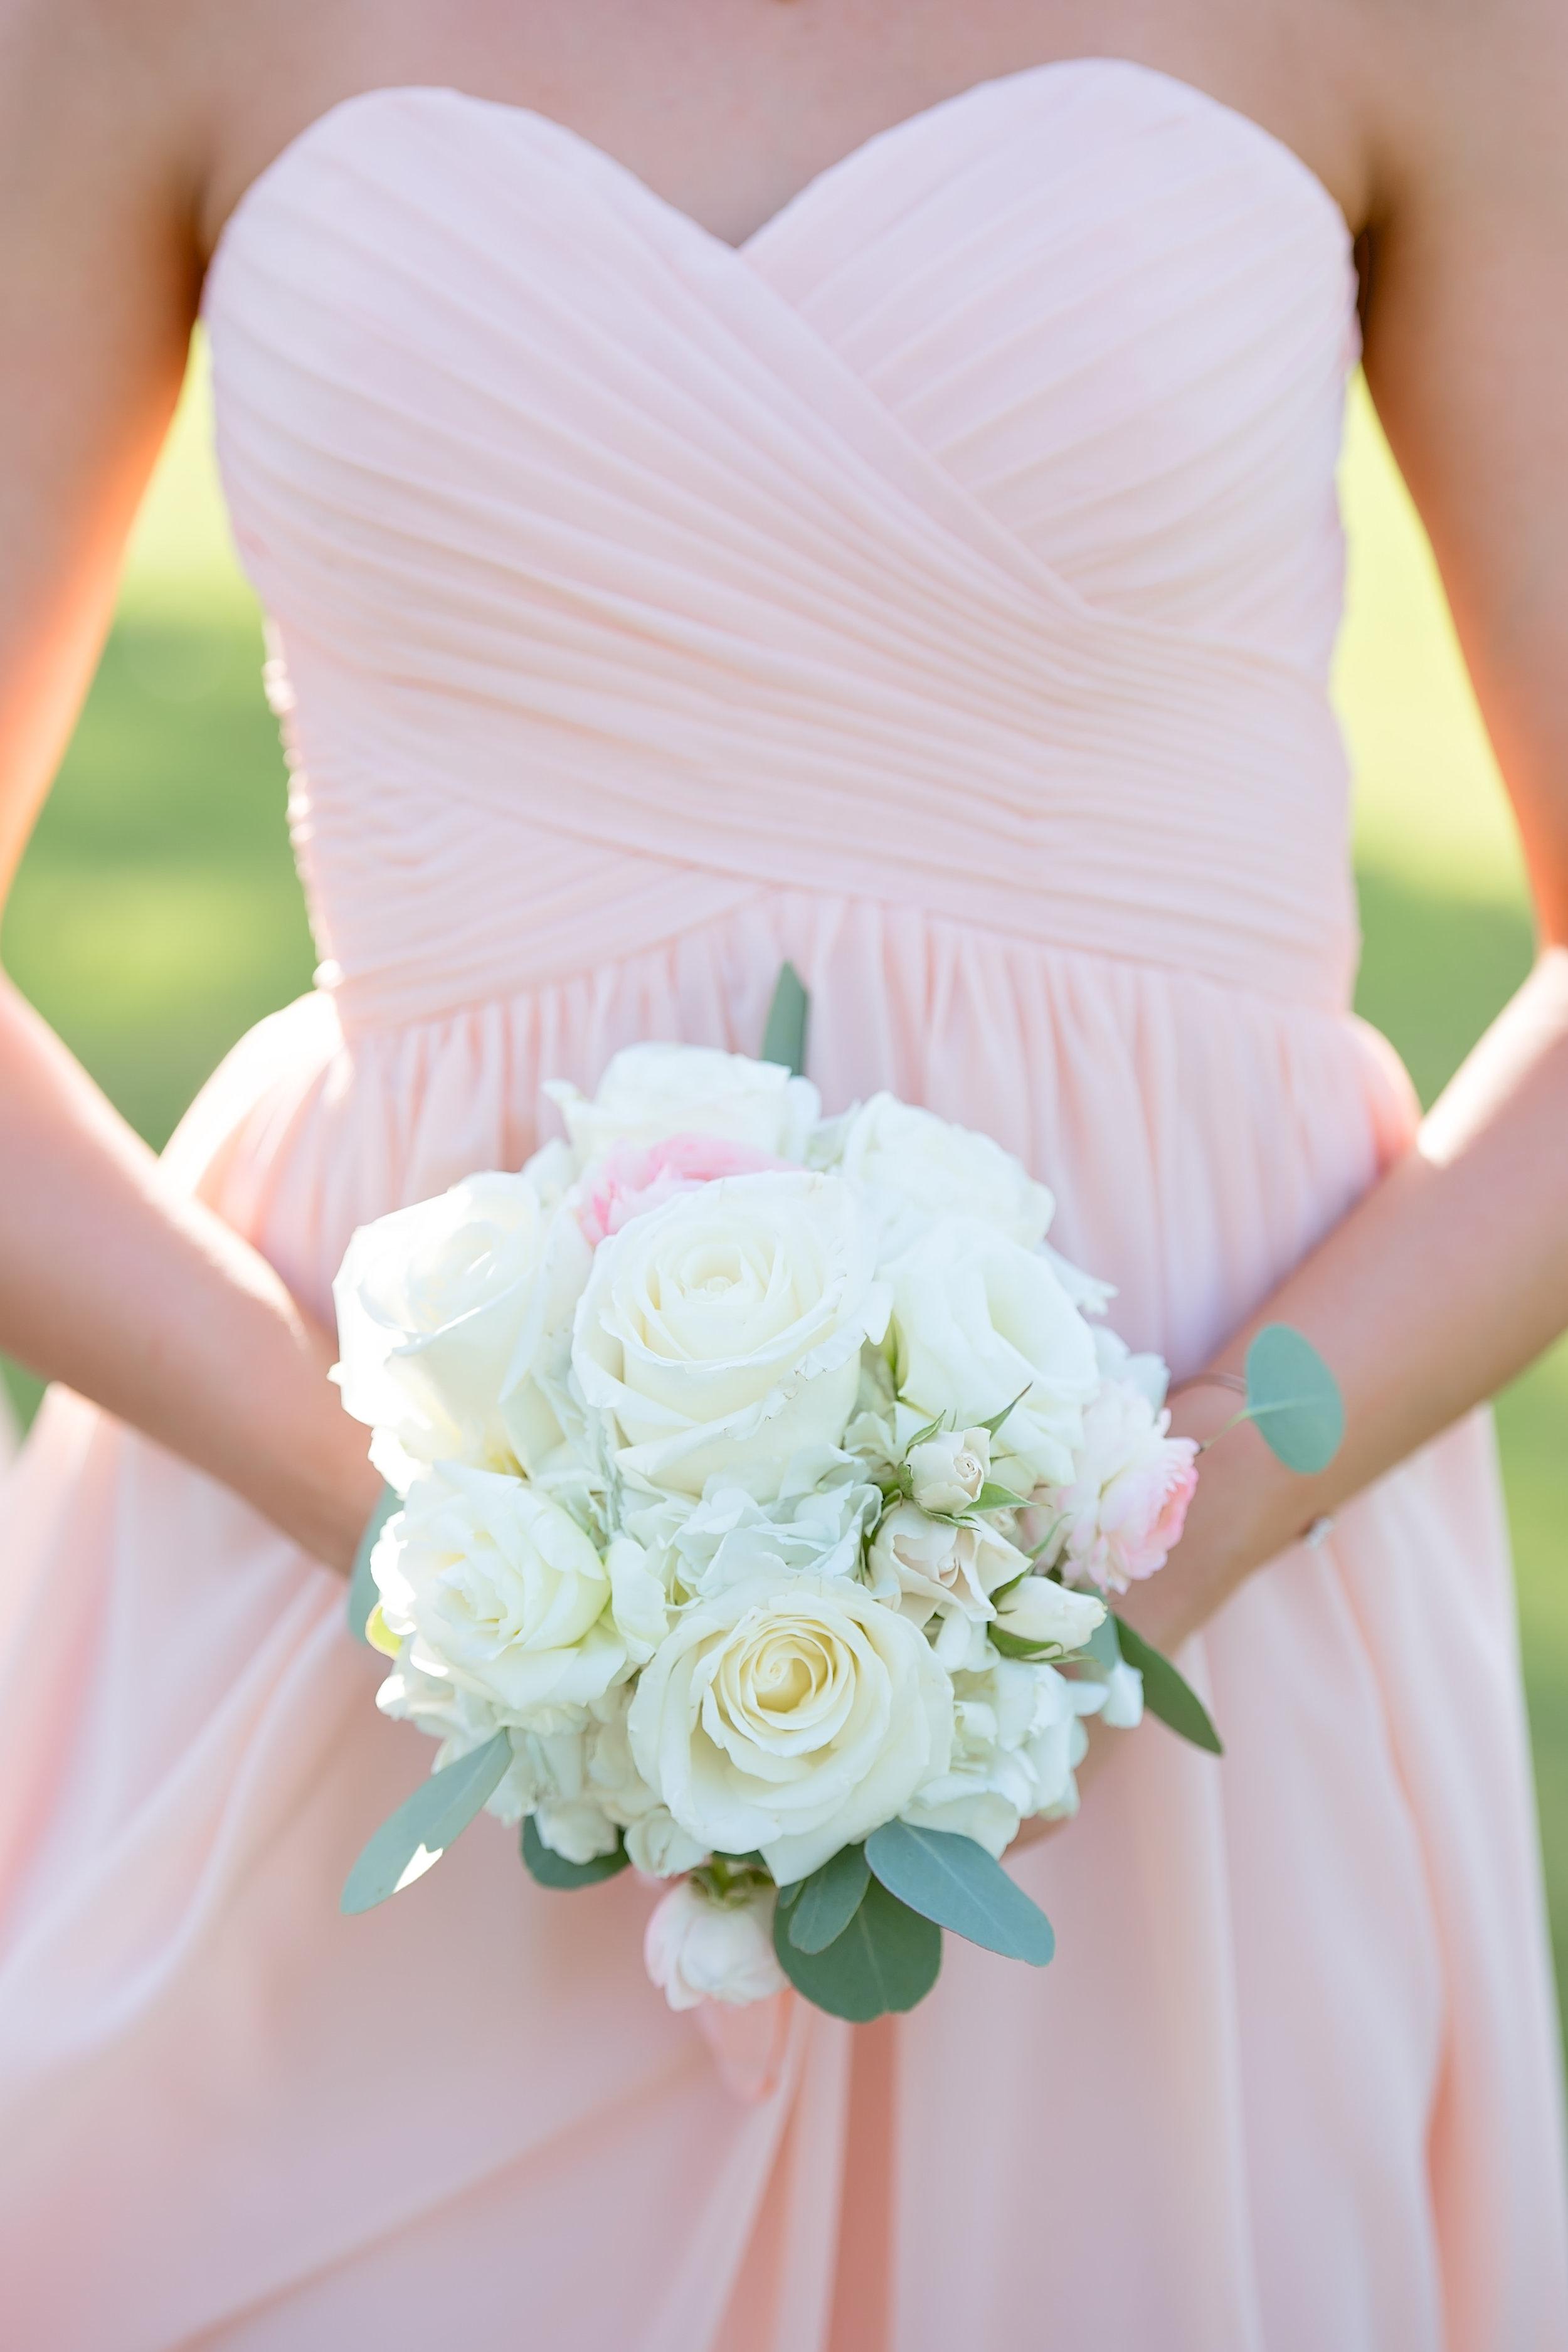 All White Wedding Bouquet - Blush and White Wedding - Los Feliz Wedding